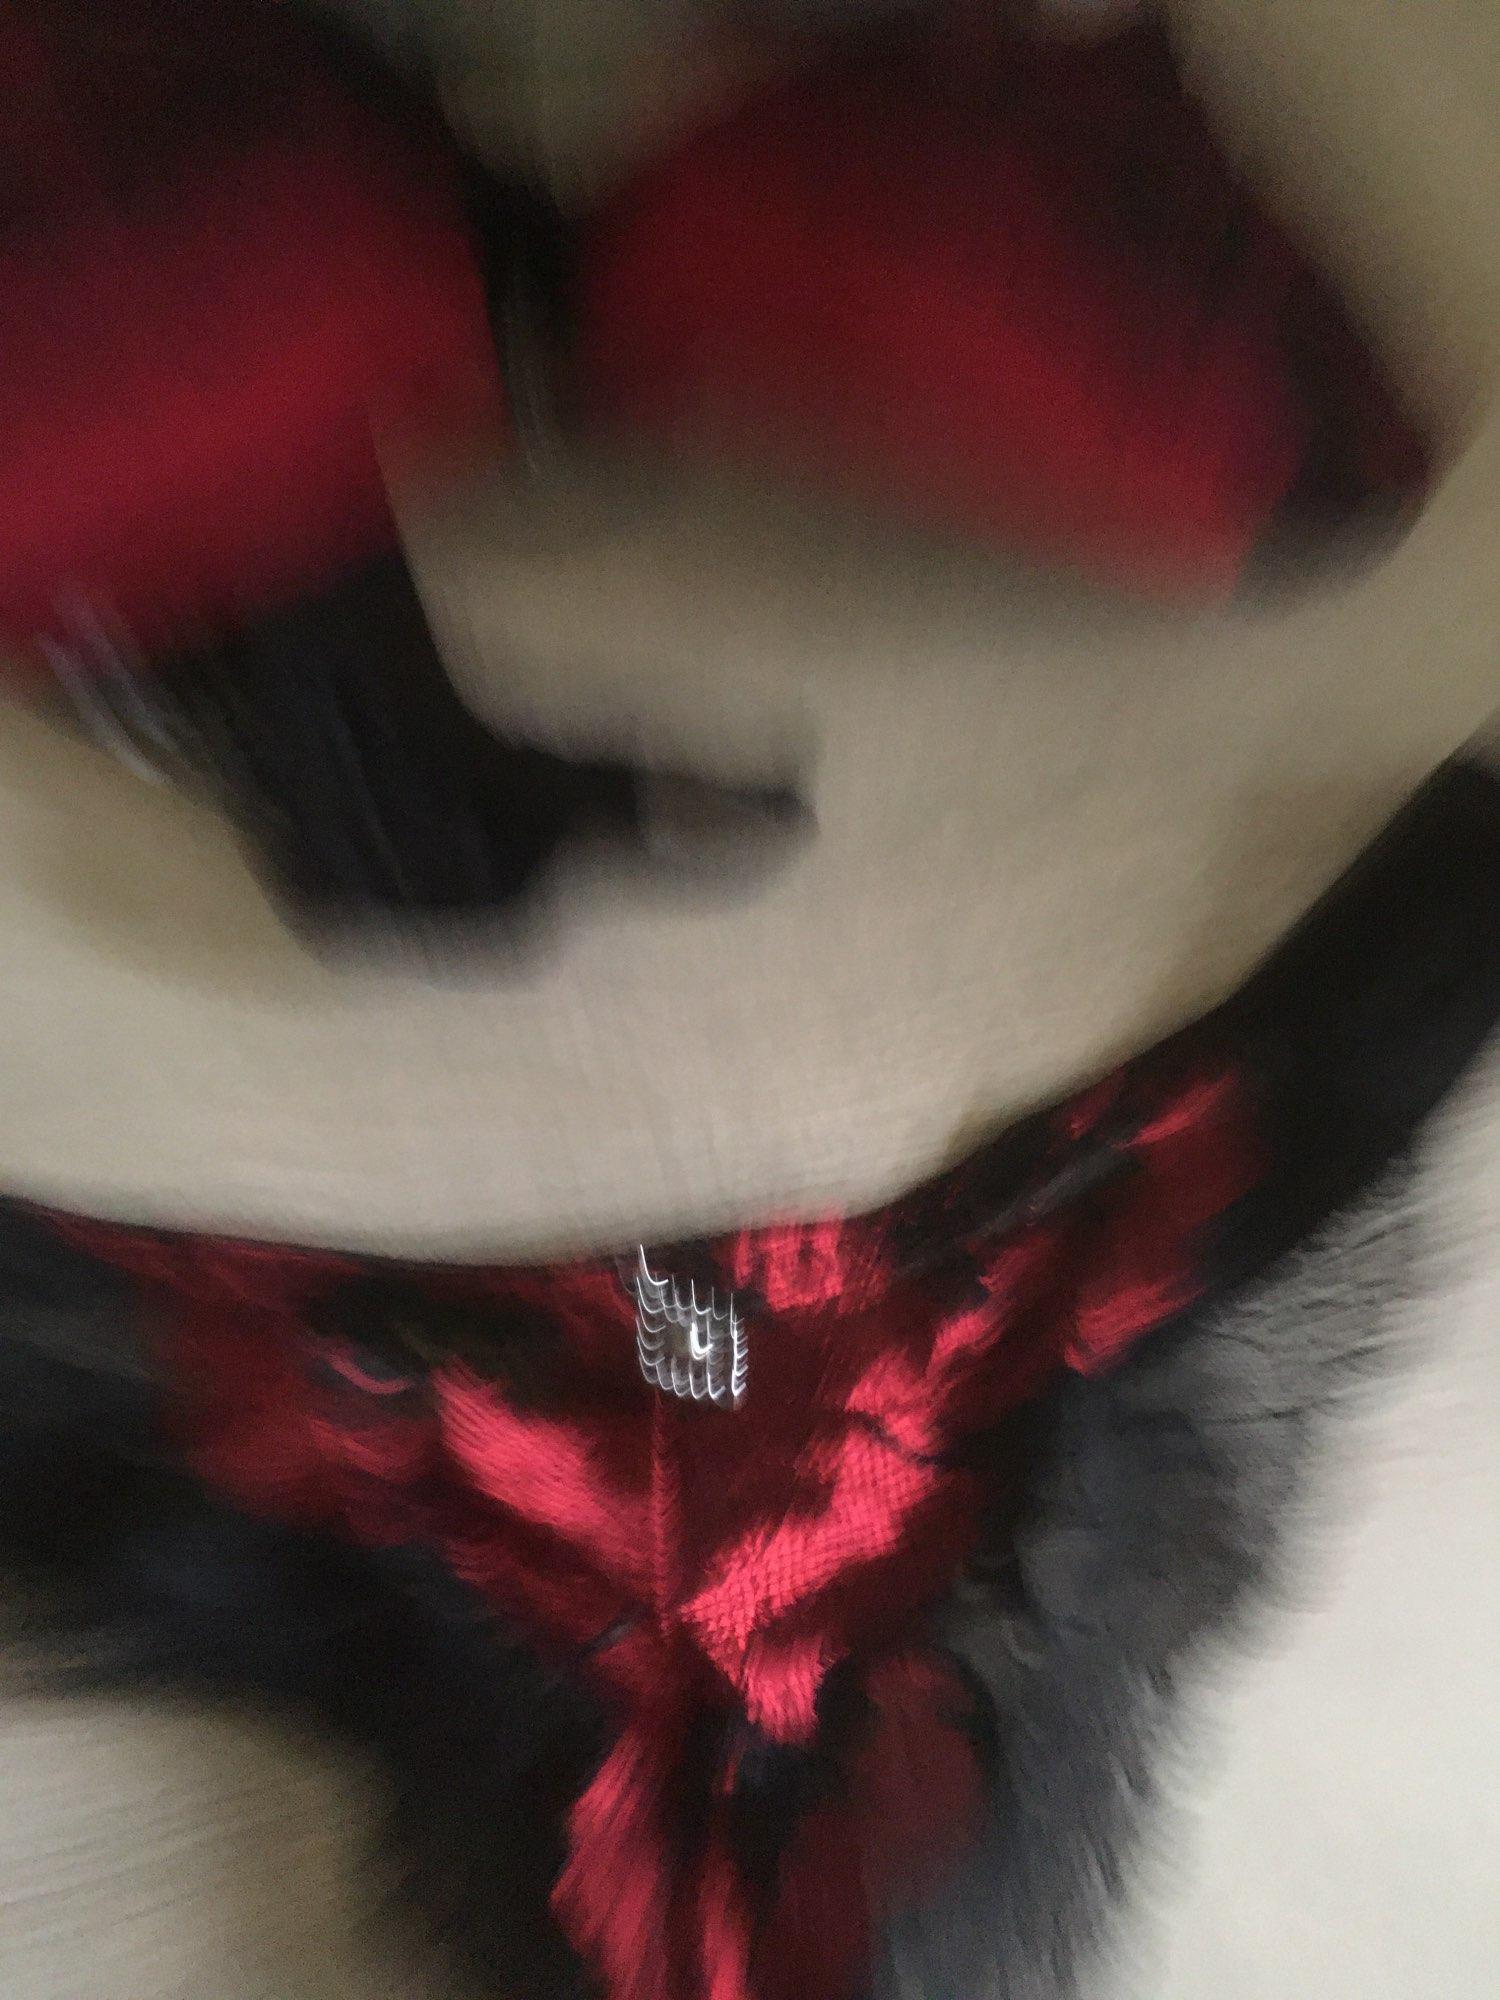 DKERT ABC 75 80 85 90 95 Thong Bra Set Push Up Lace Women Underwear Panty Set Set Hollow Out G String Embroidered Bra Brief Sets underwear panties set thong bra setbra set - AliExpress